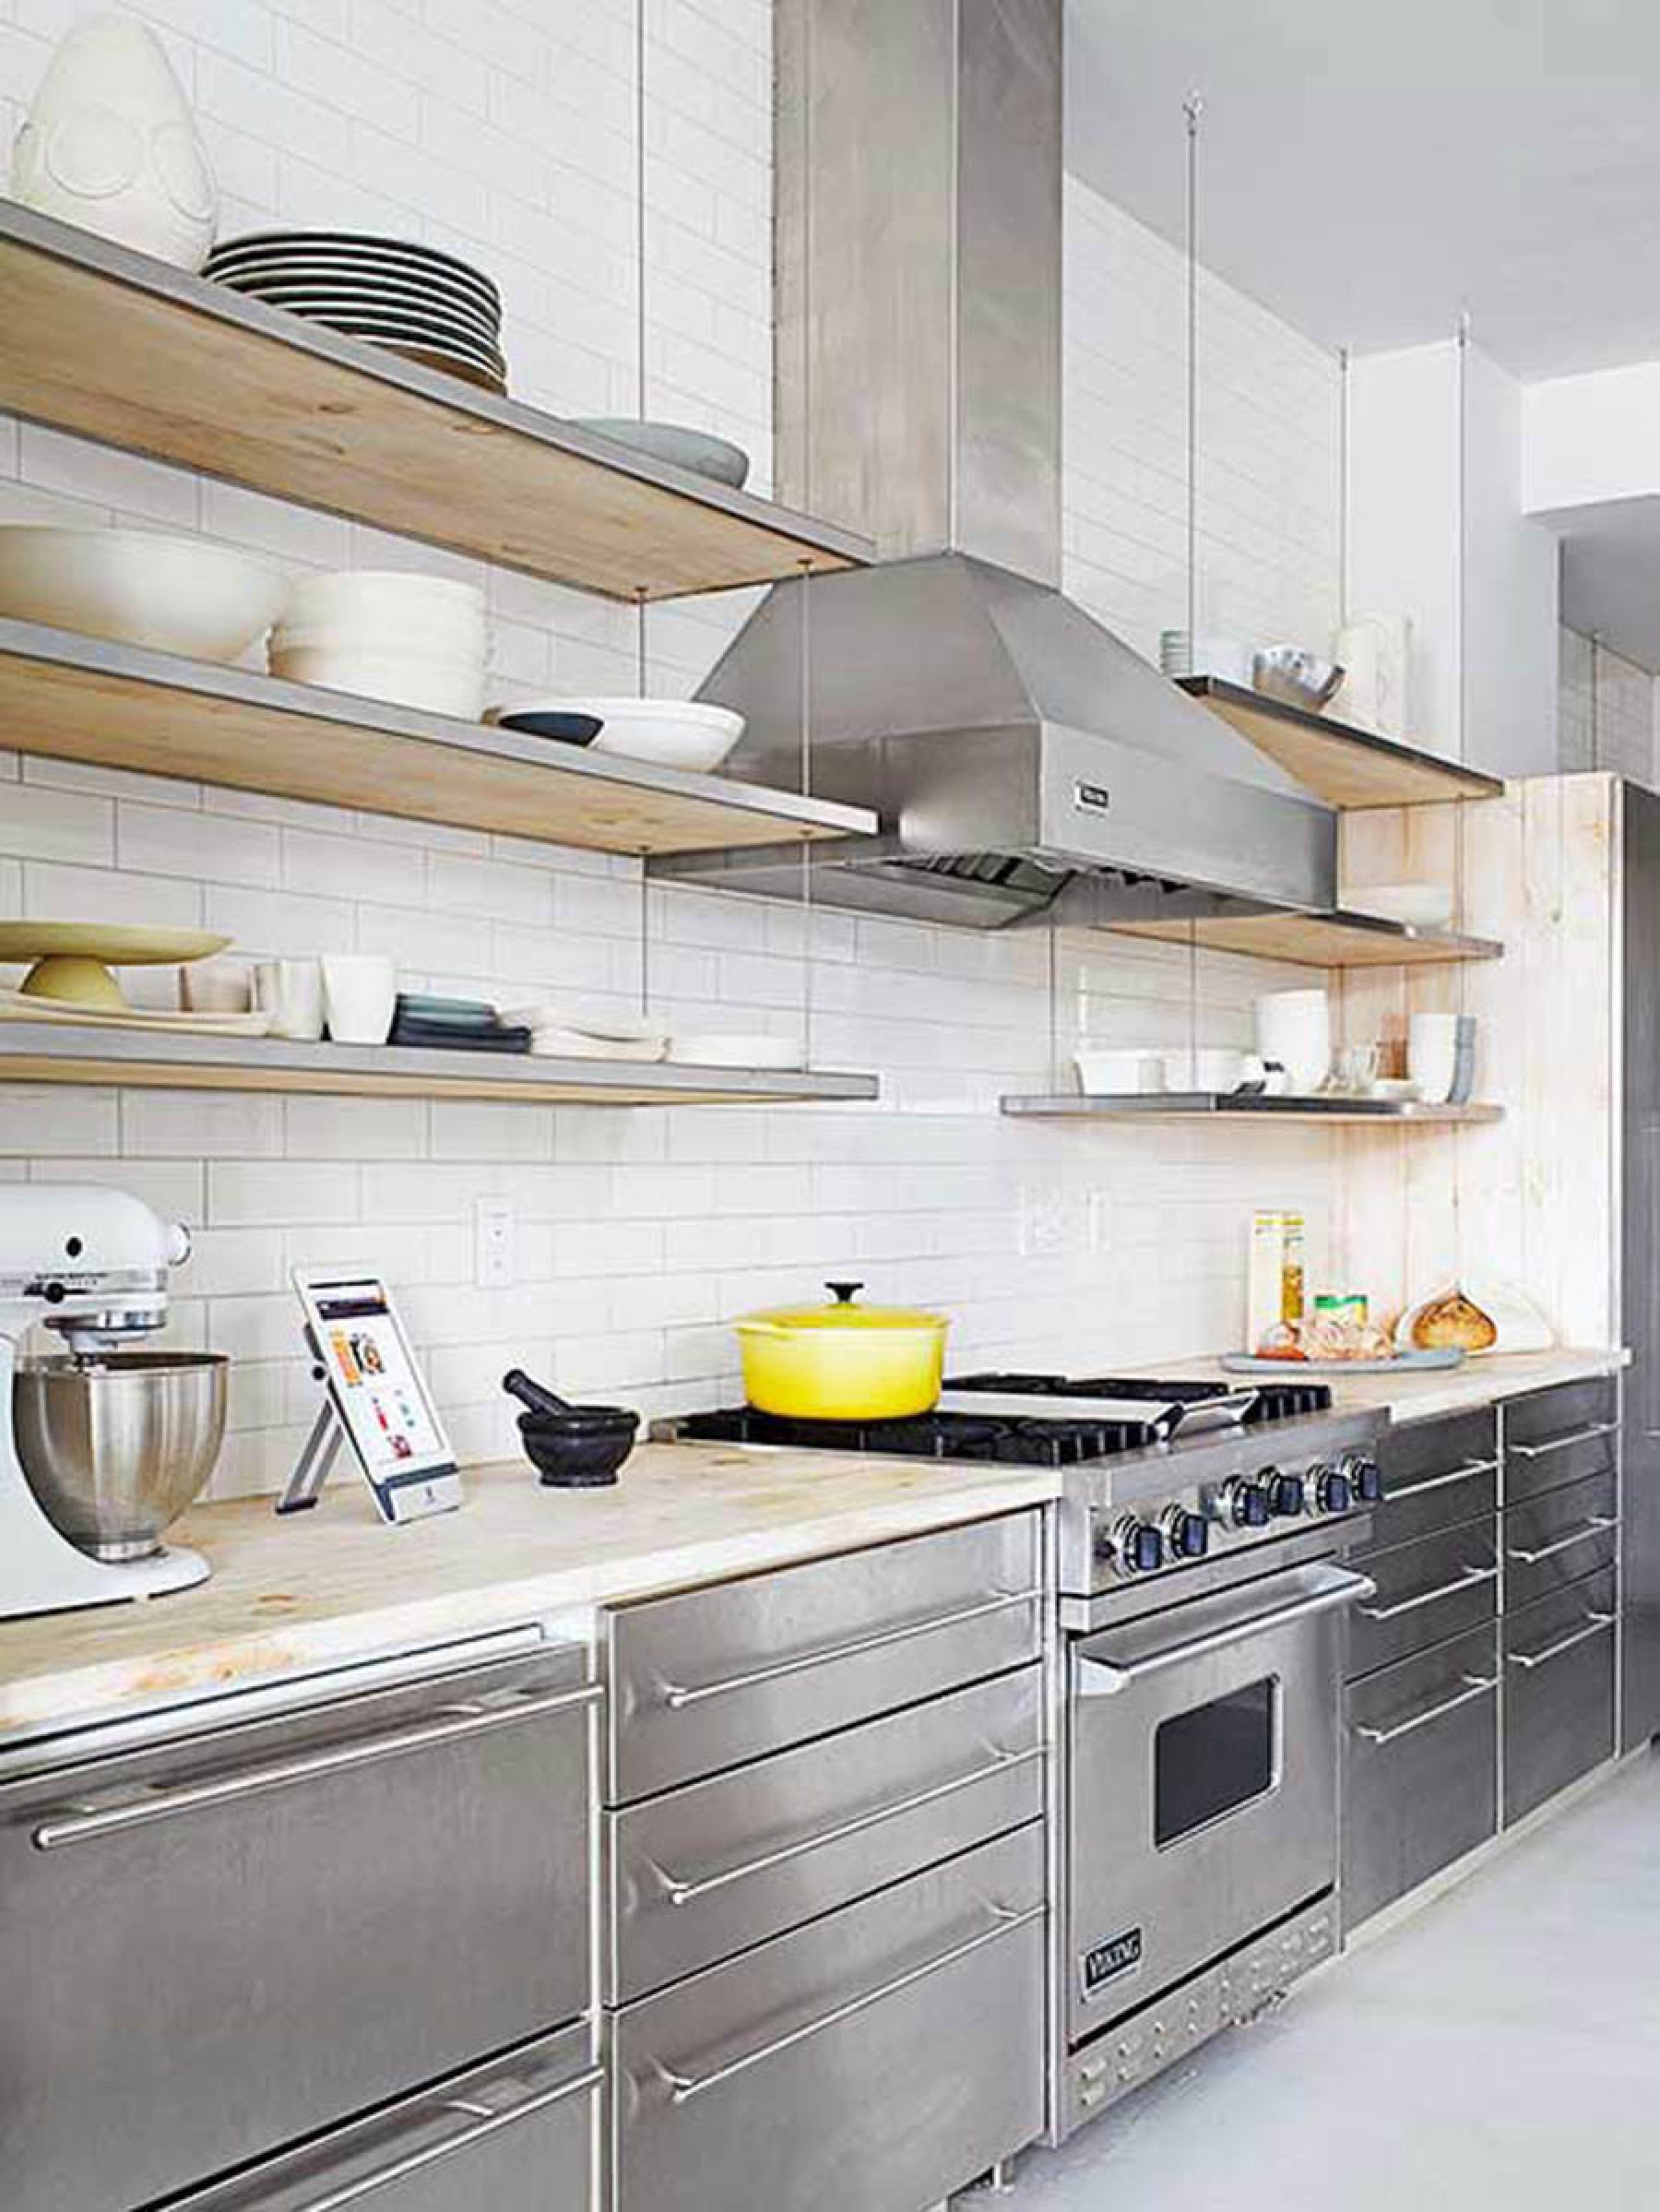 Tour a Home That Checks All Our Favorite Design Trend